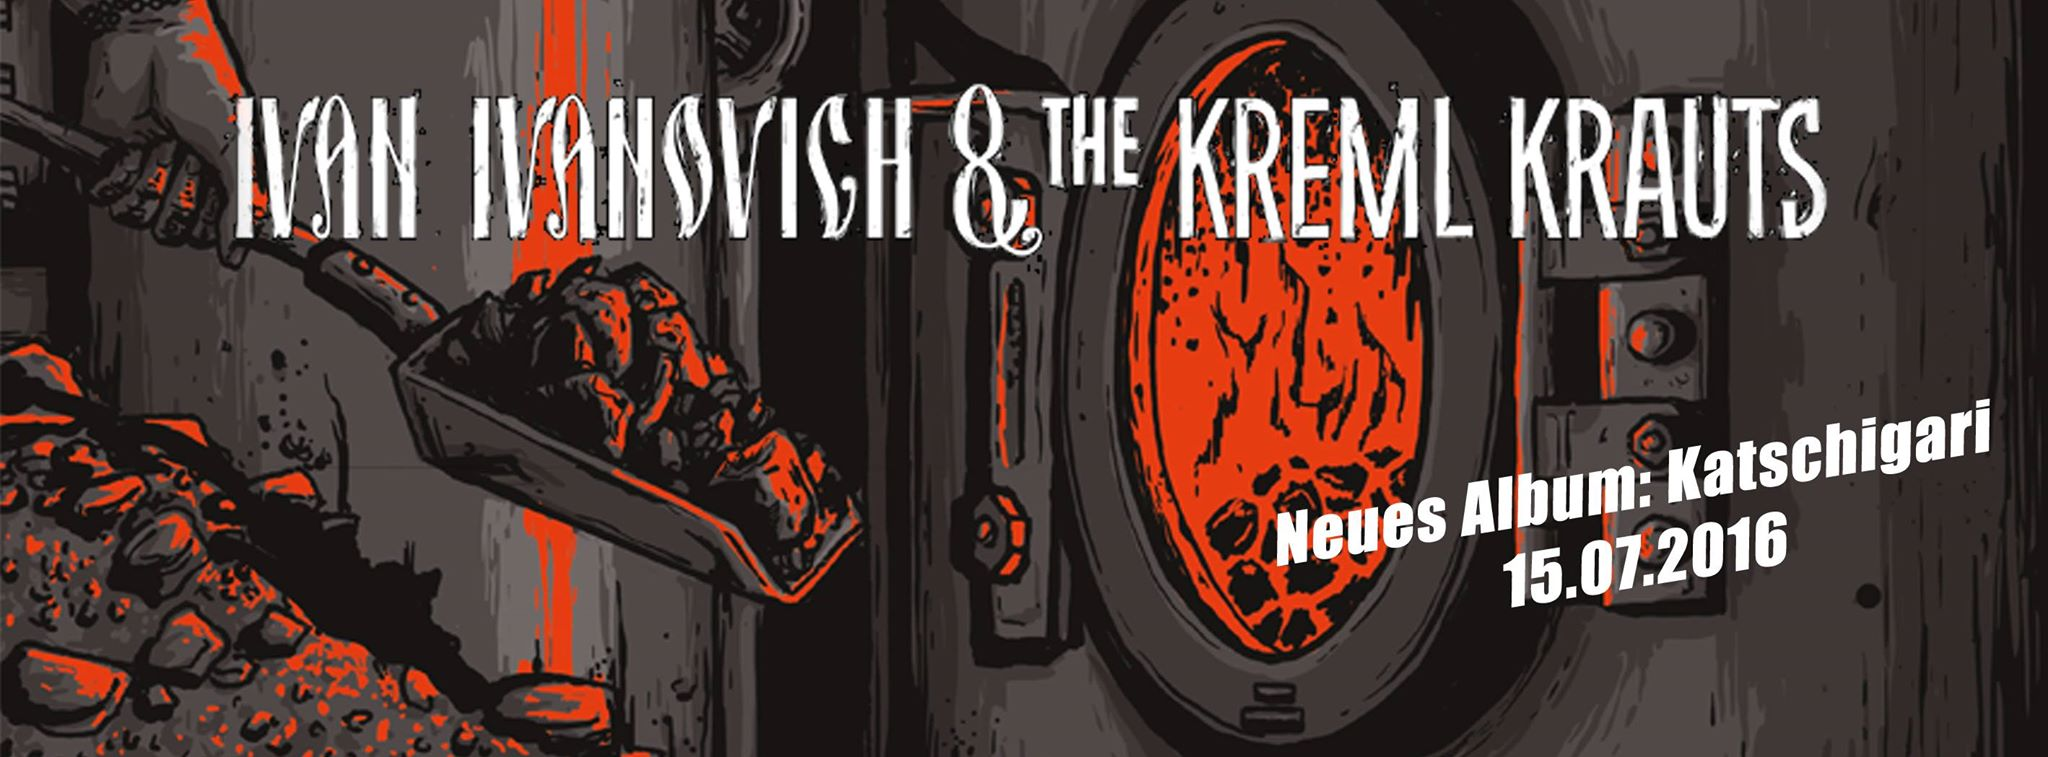 Ivan Ivanovich & The Kreml Krauts